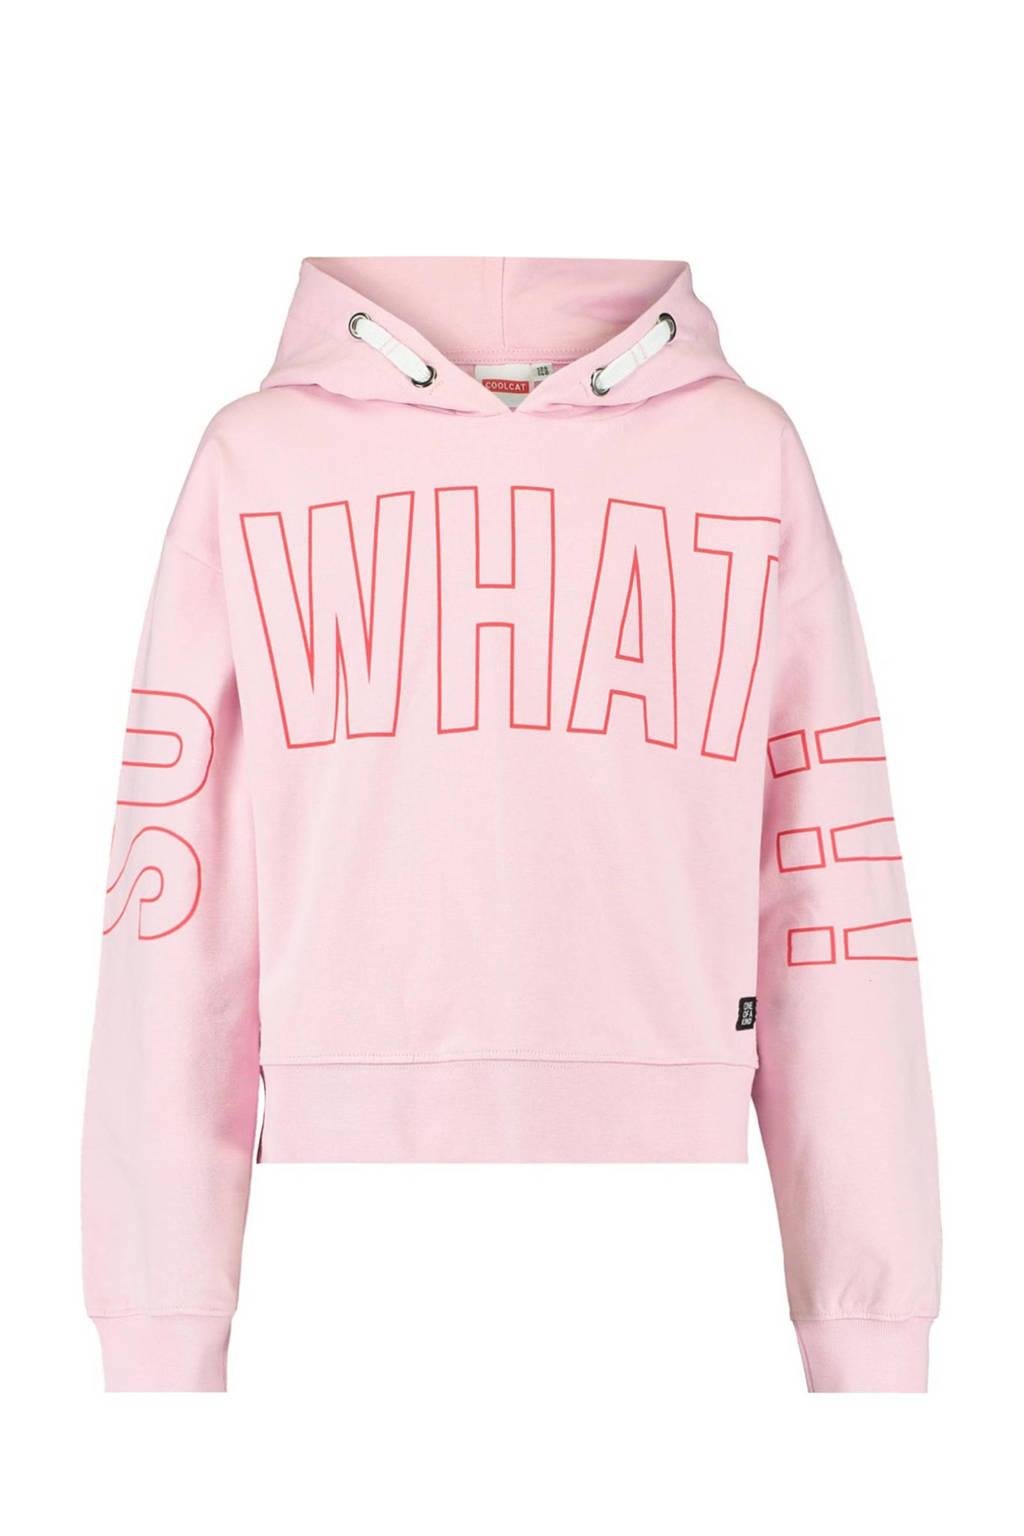 CoolCat Junior hoodie Simone met tekst roze/rood, Roze/rood